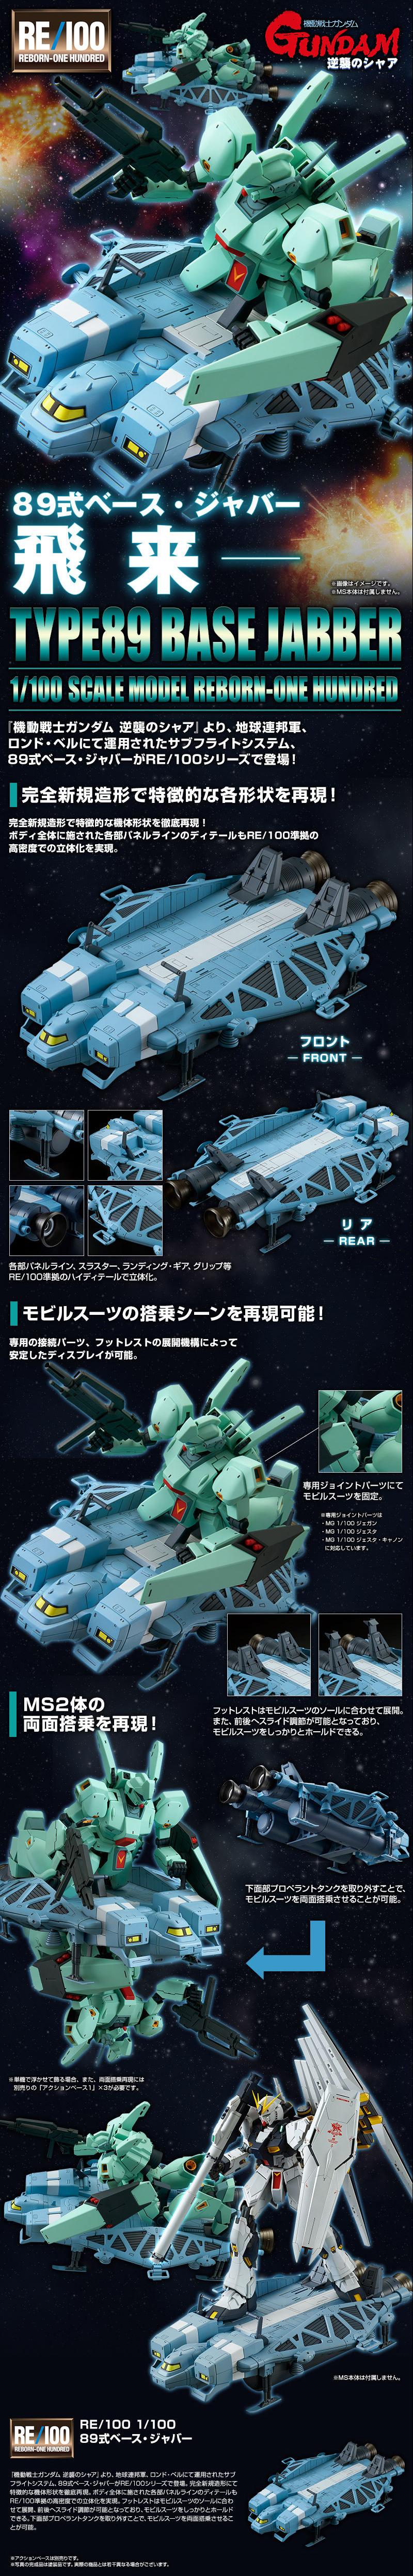 P-Bandai RE/100 Base Jabber Details